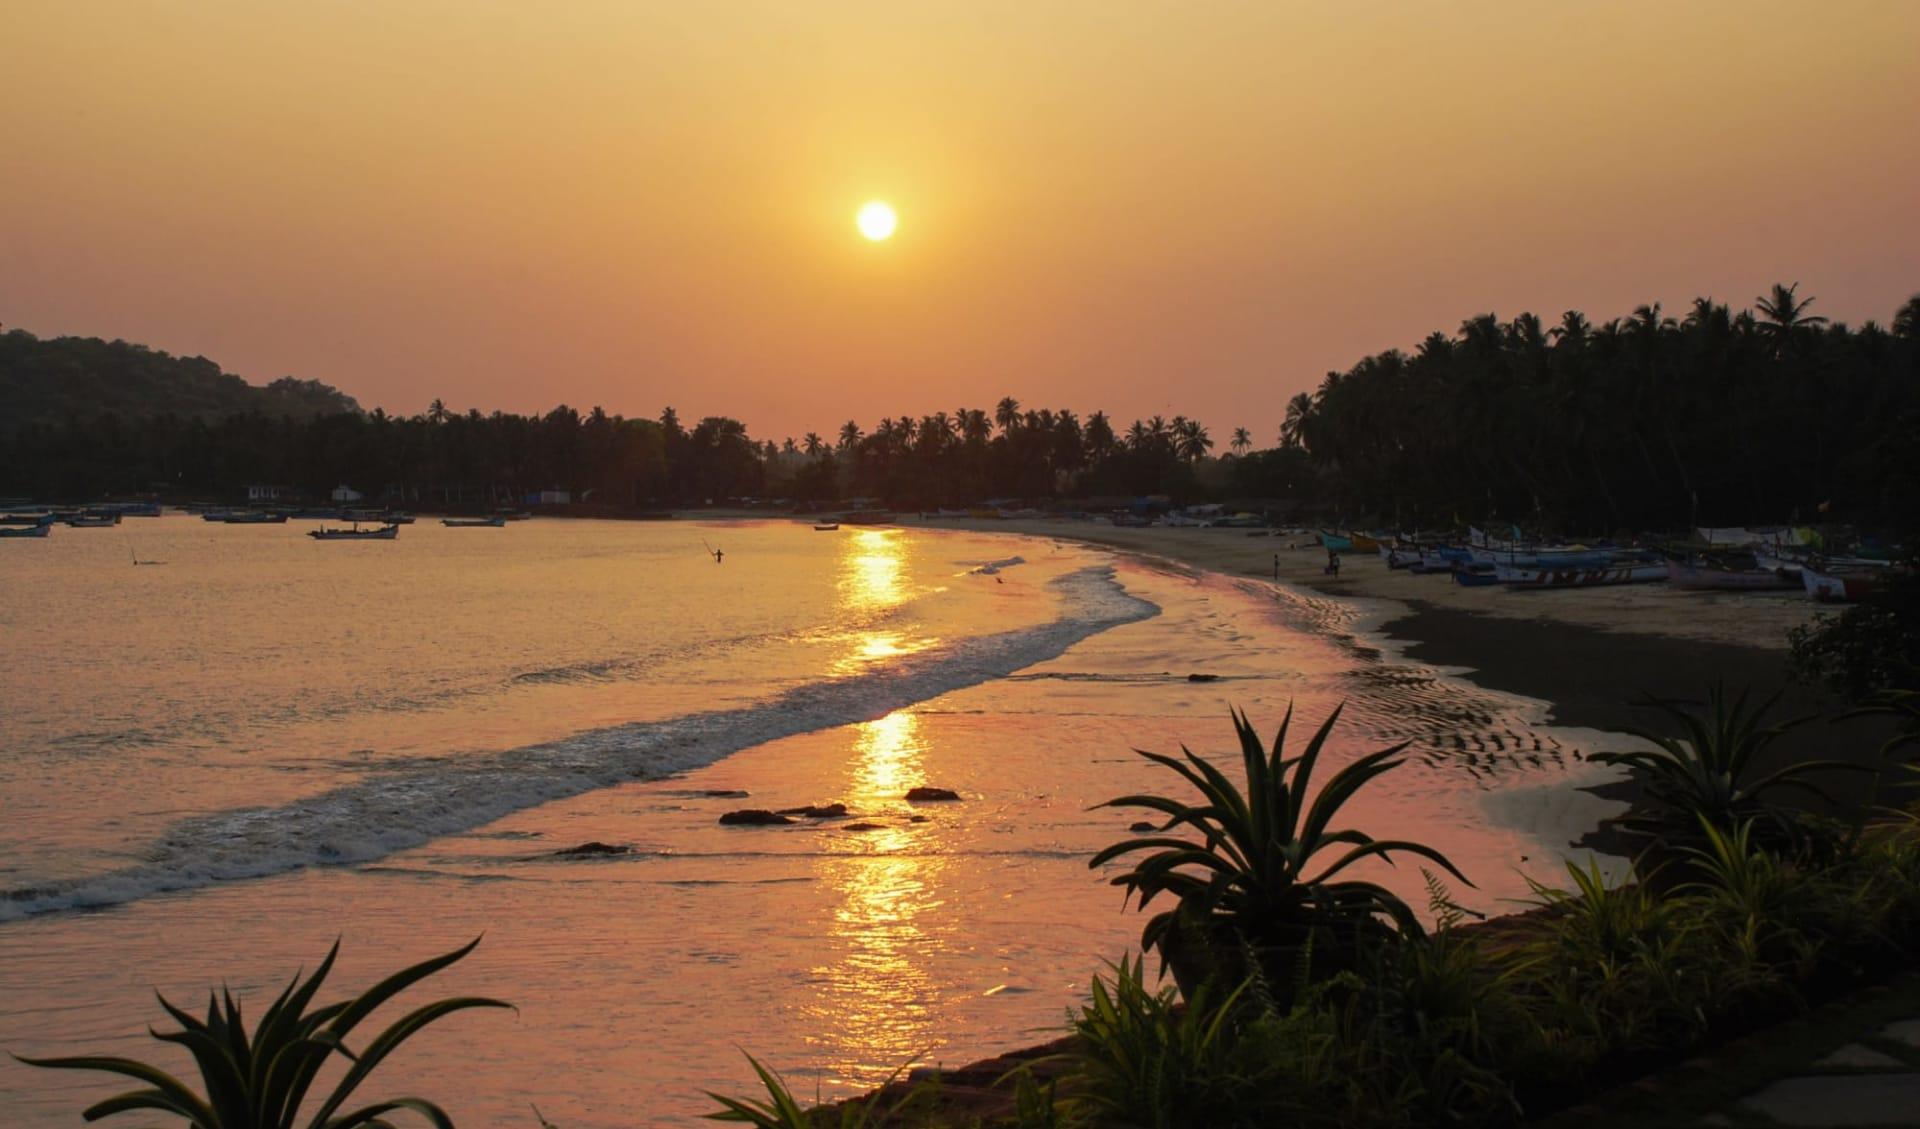 Ahilya by the Sea in Goa: Beach at Sunset